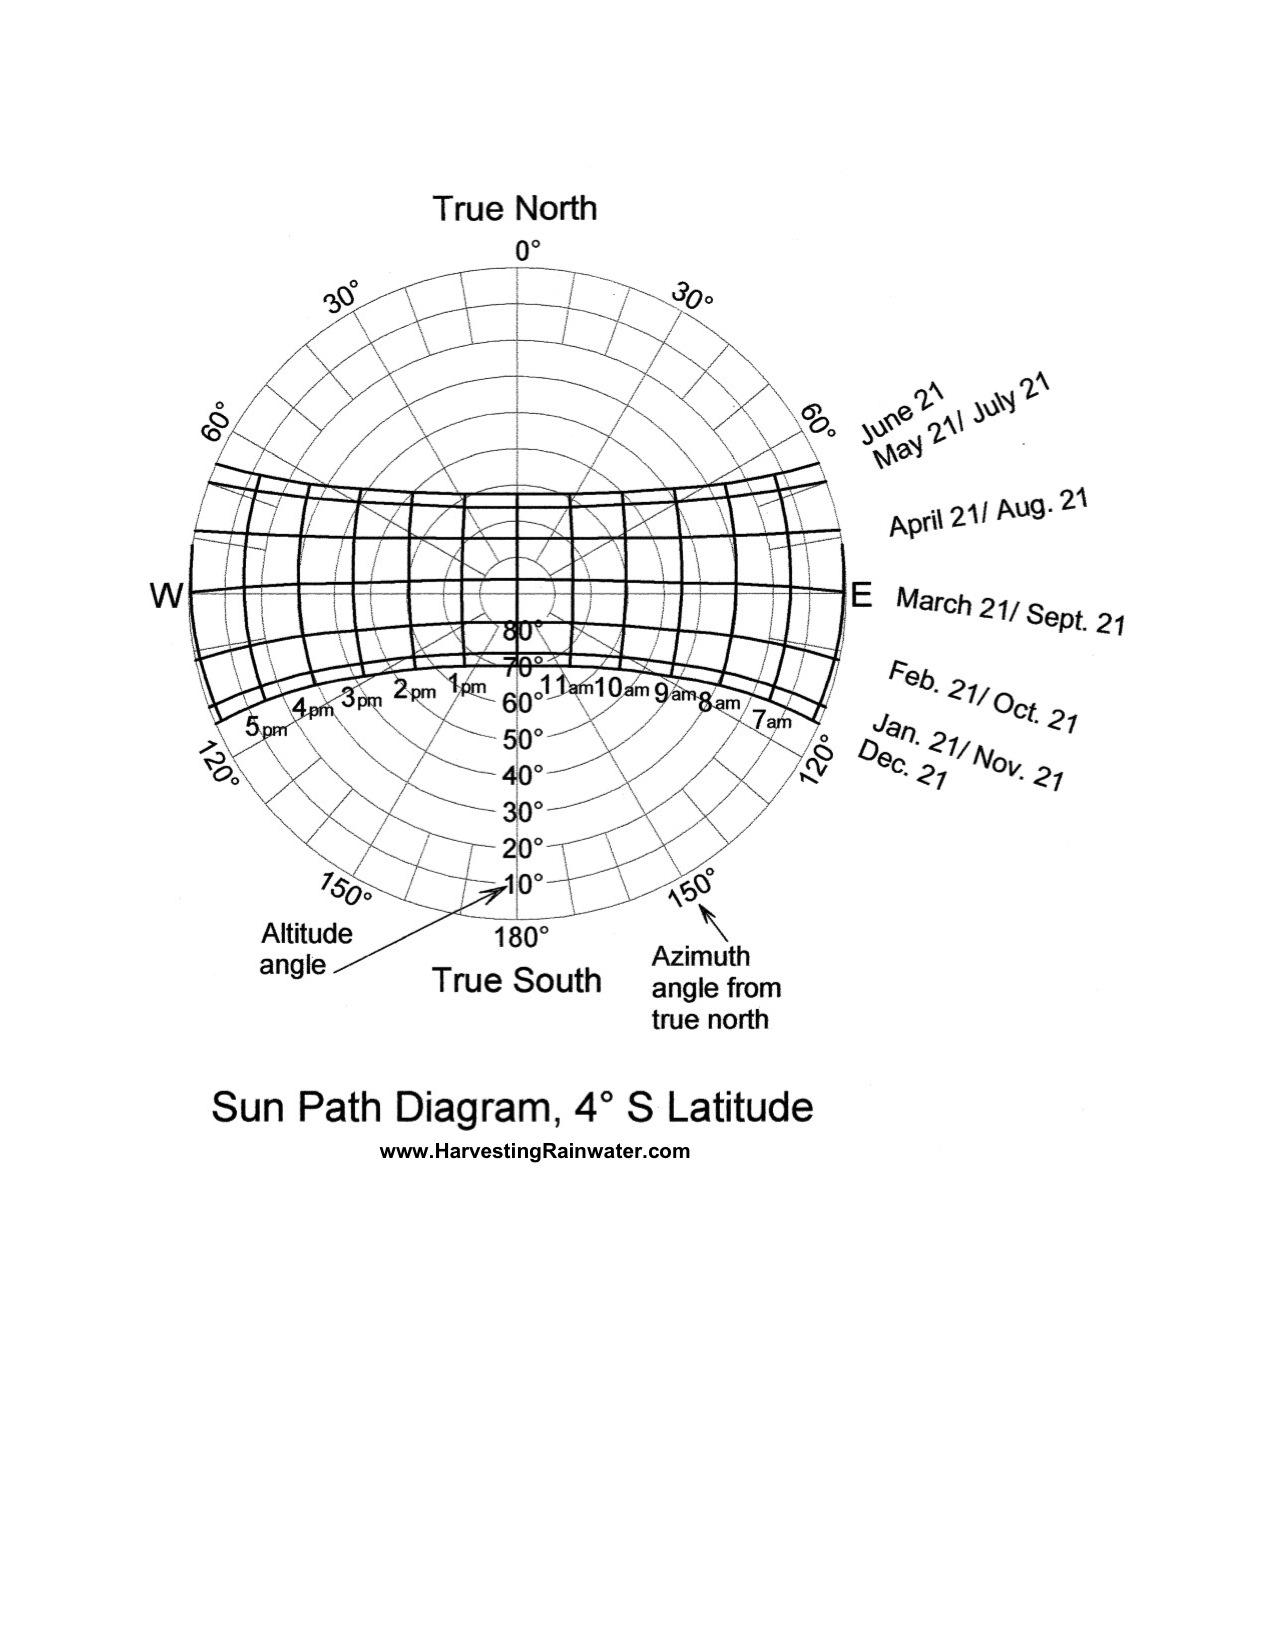 Sun Path Diagram 40o S Latitude